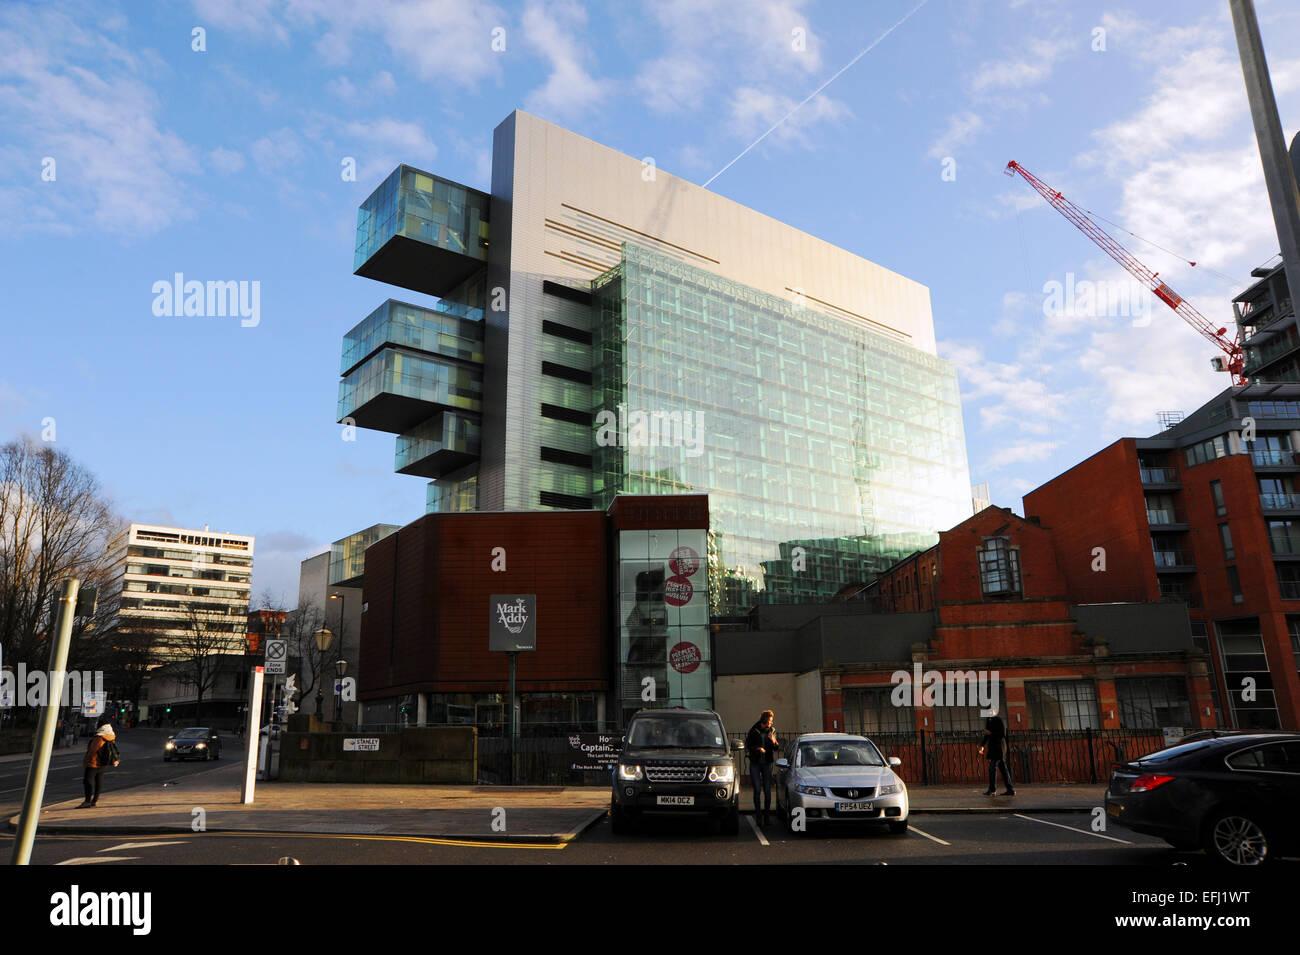 Manchester Lancashire UK - Manchester Civil Justice Centre January 2015 - Stock Image